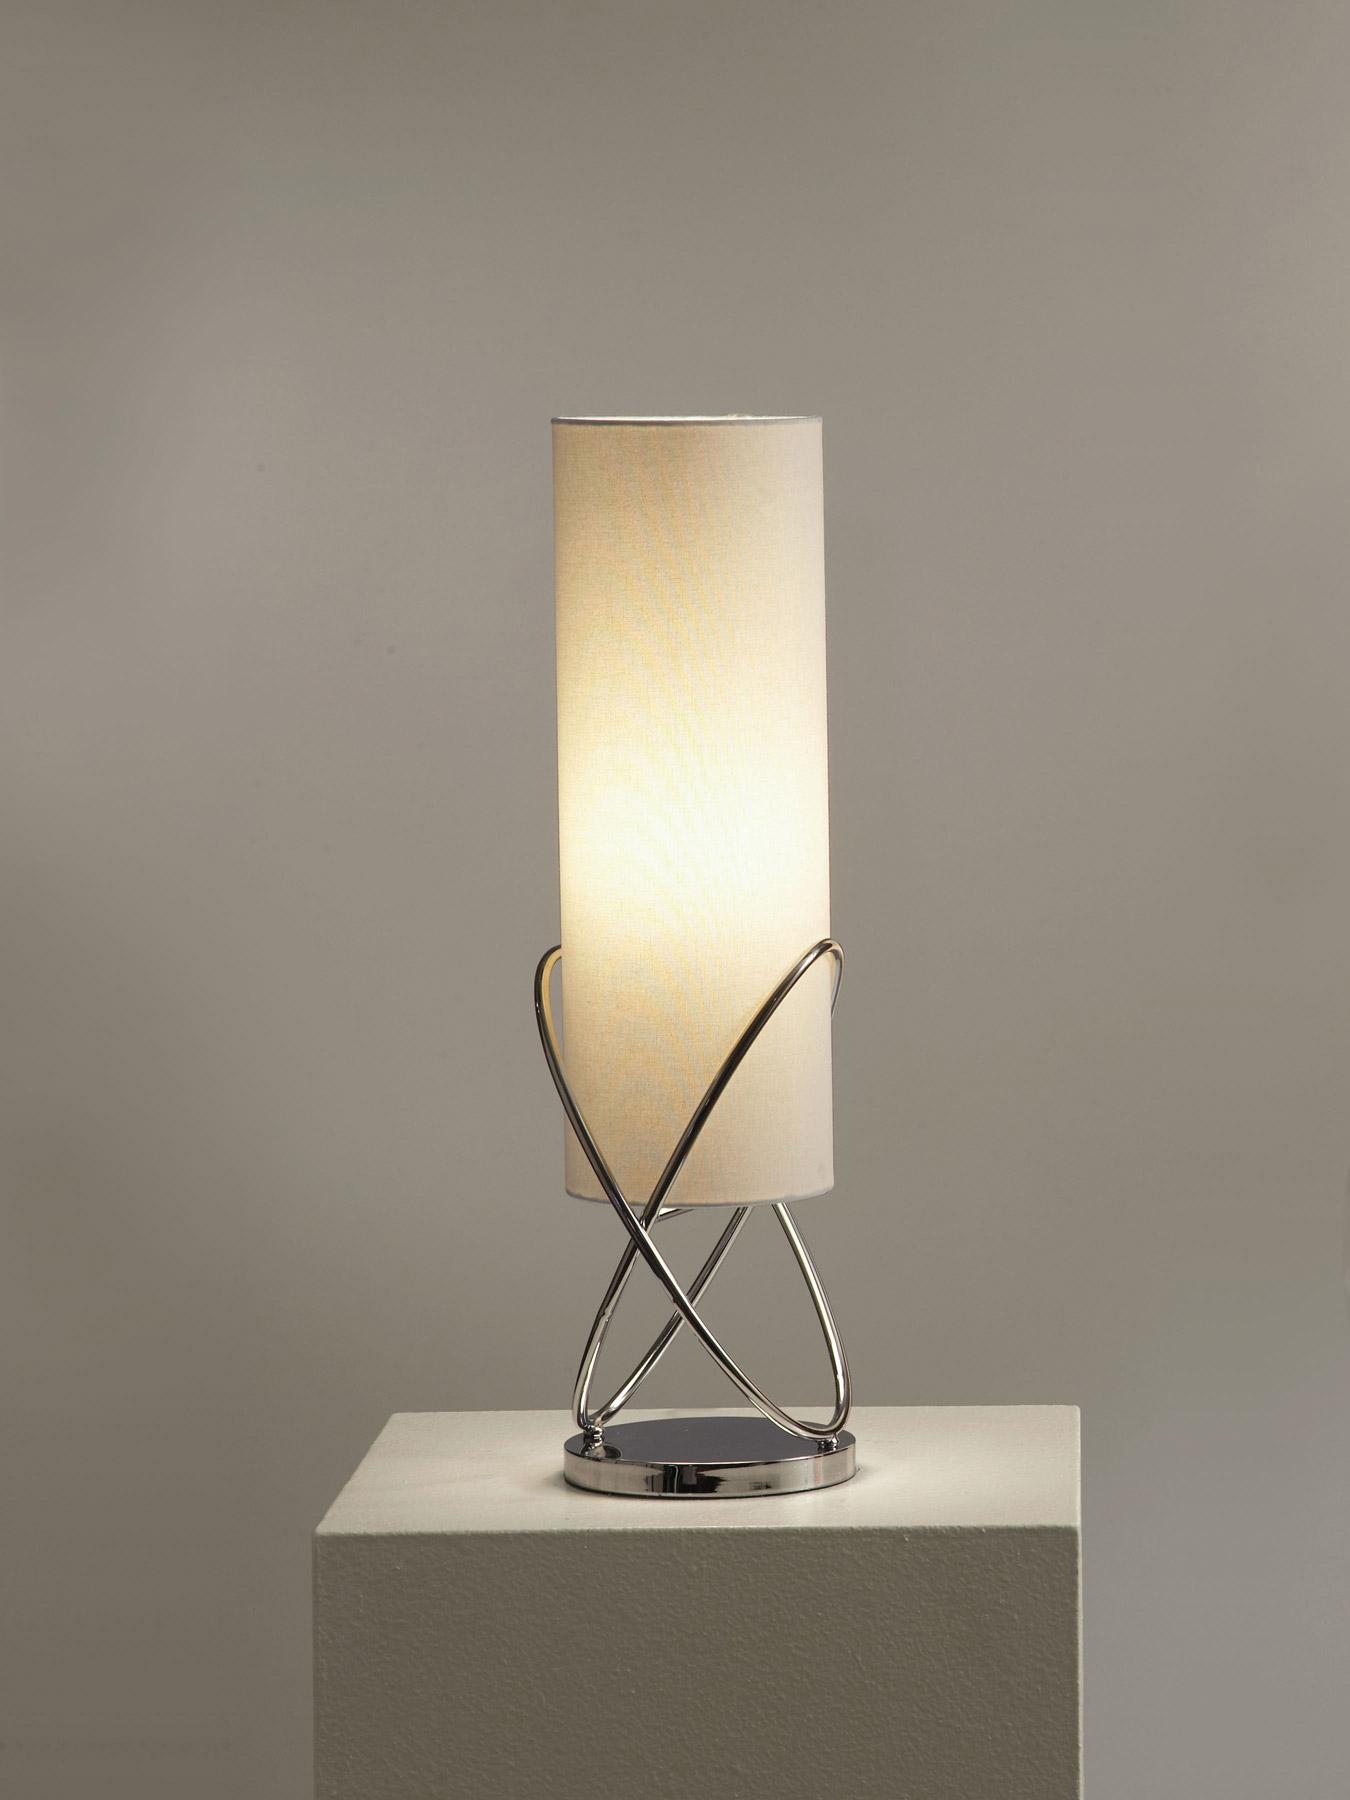 Nova Lighting 11189 Internal Table Lamp